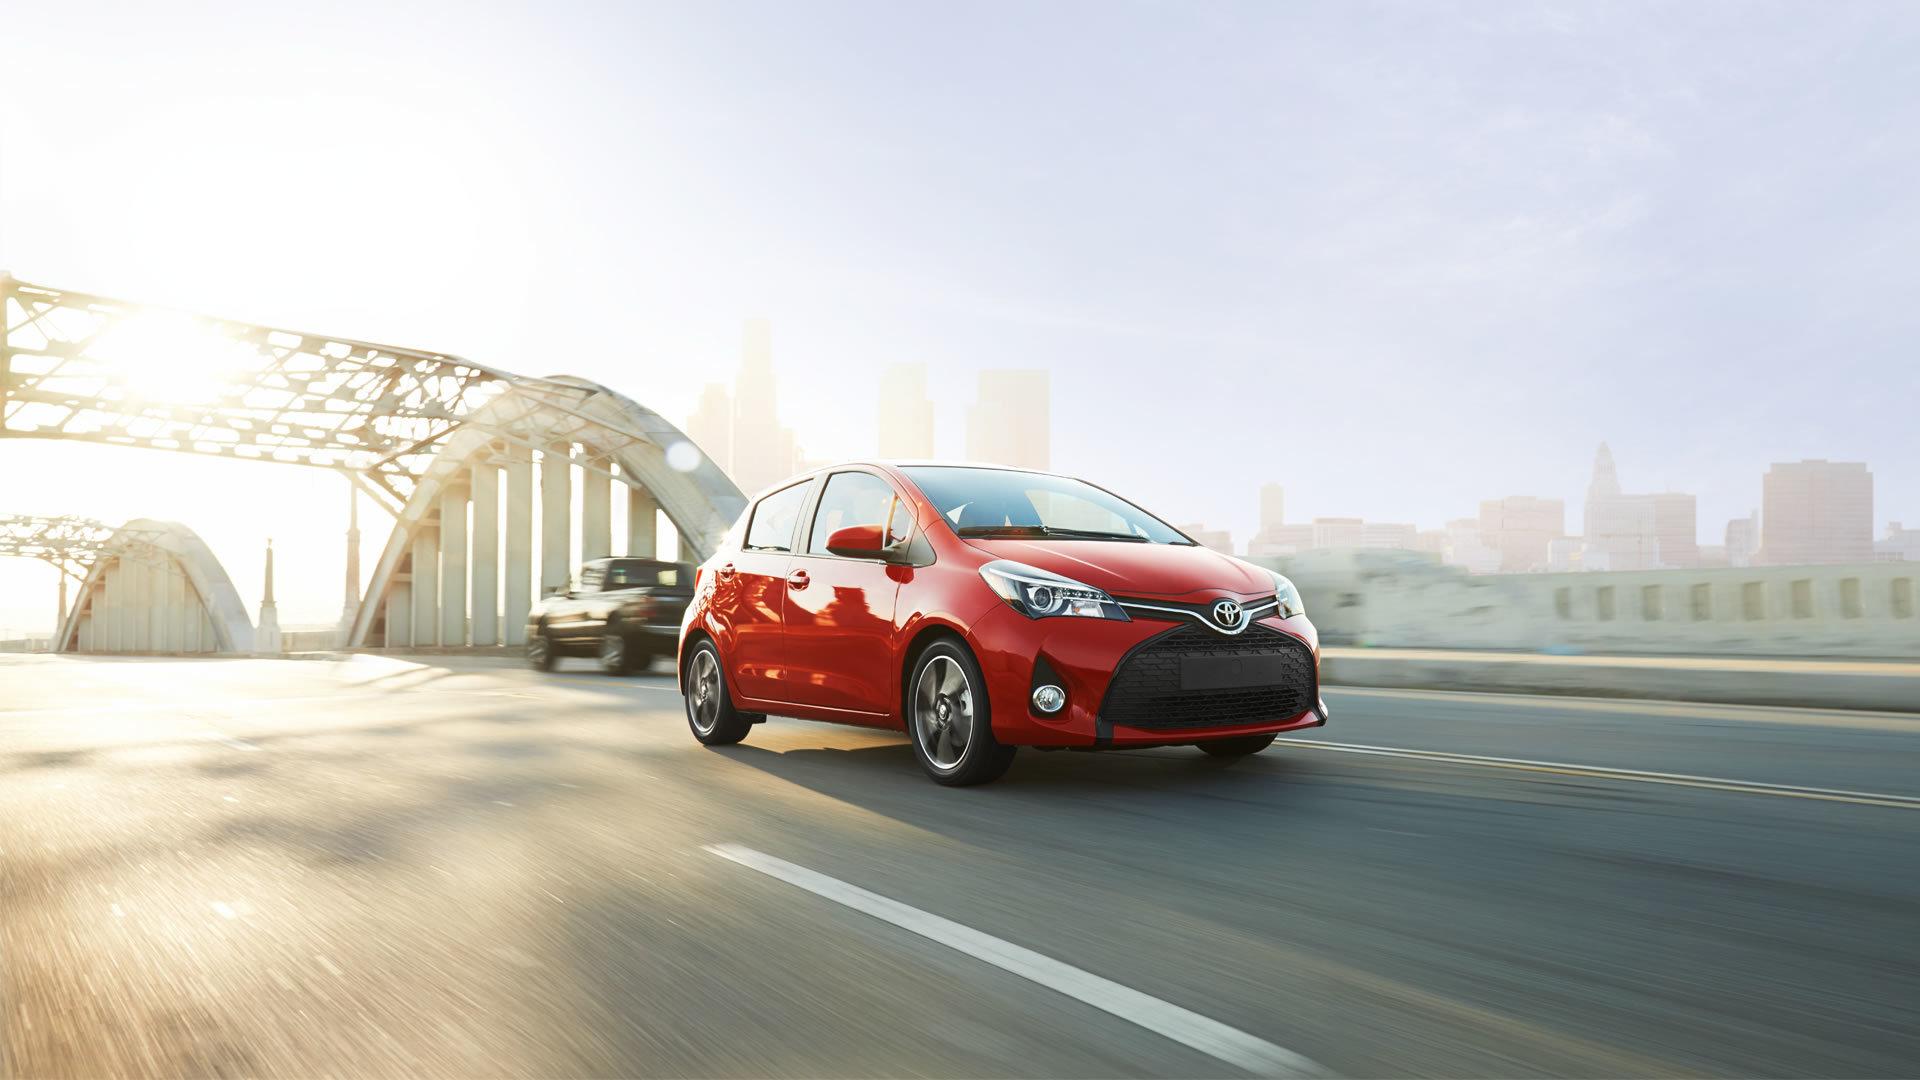 2015 Toyota Cars For Sale In Yakima Bud Clary Toyota Of Yakima